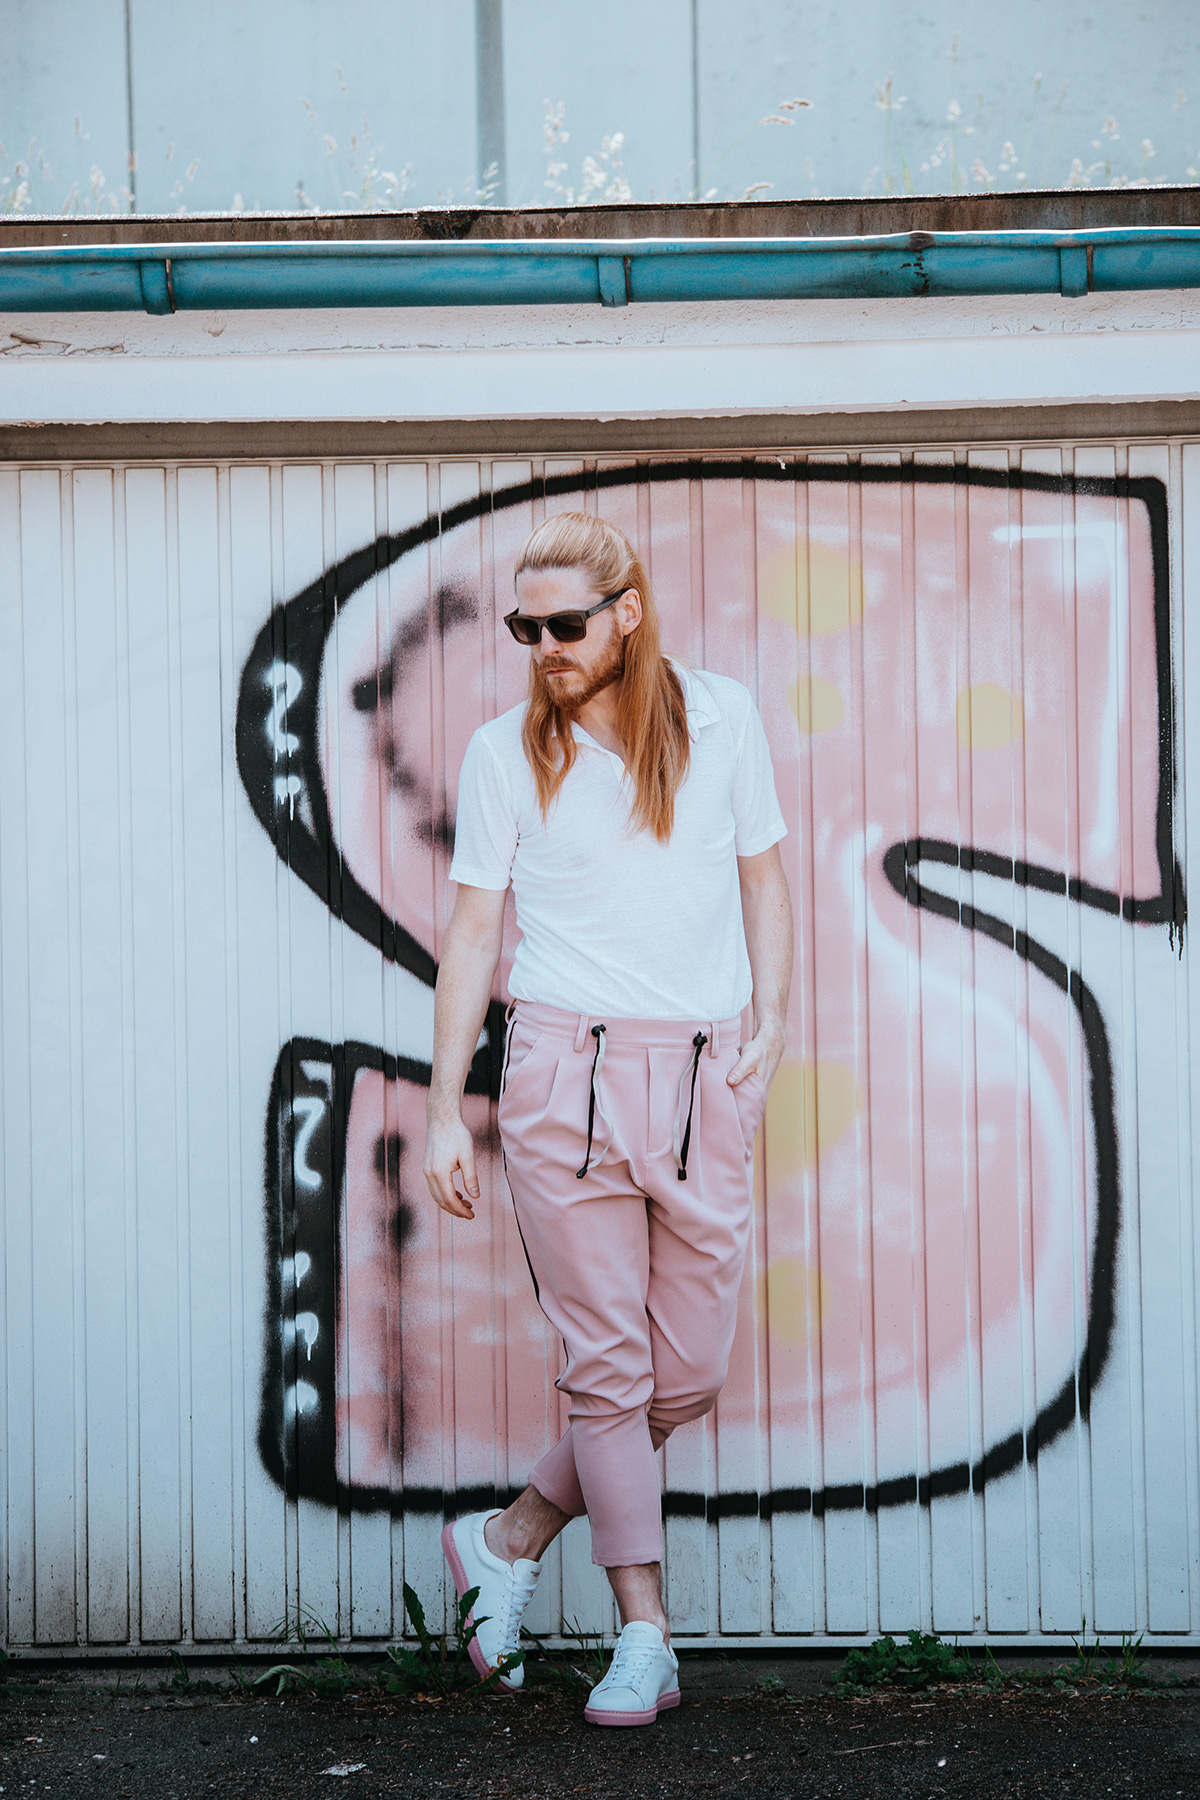 Sommerlook-Poloshirt-Snheaker-Maennermode-Fashion-Style-Influencer